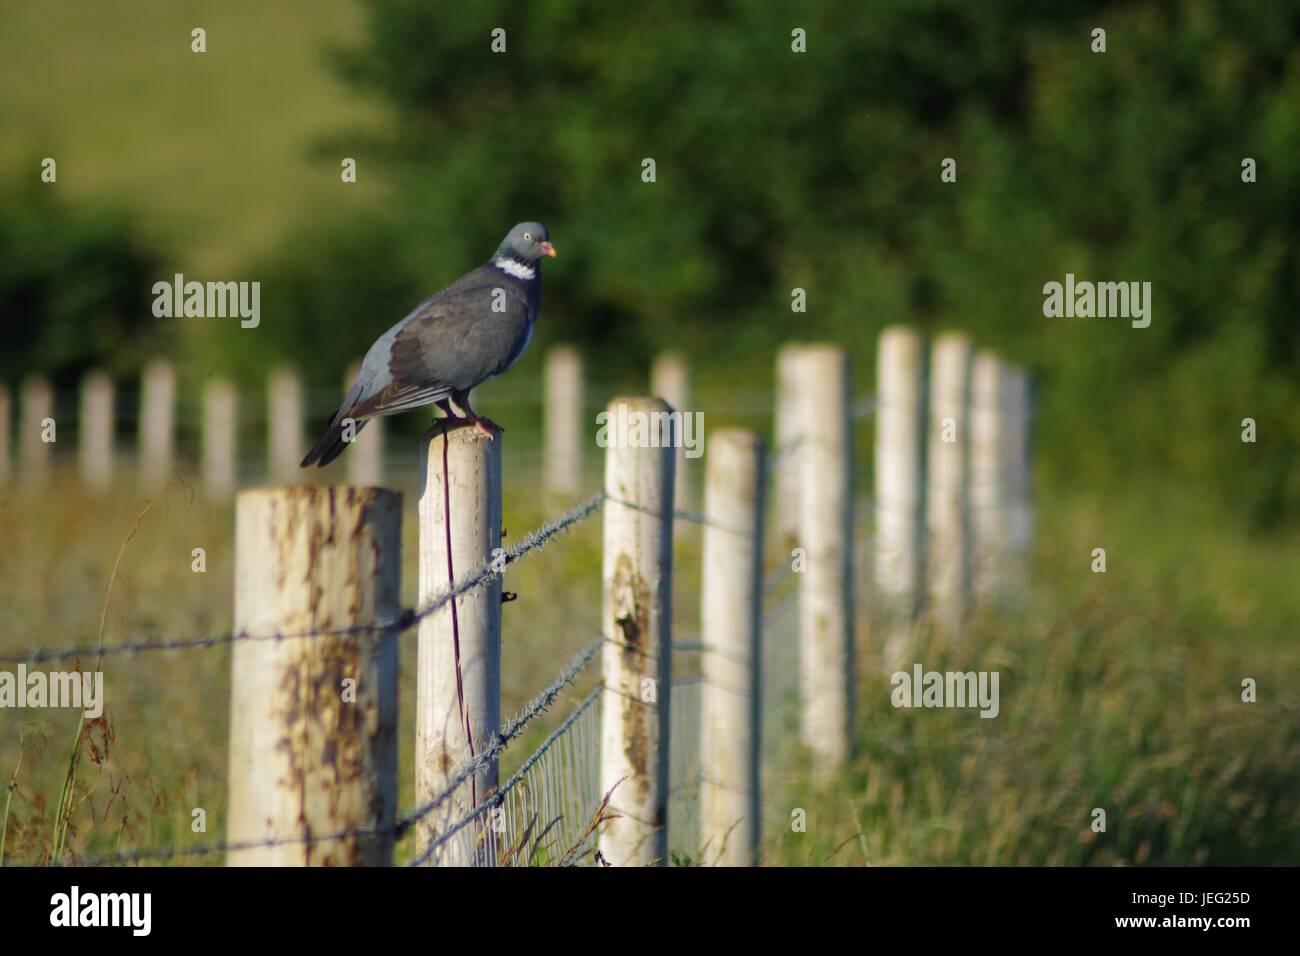 Wood Pigeon (Columba palumbus) on a Farm Fence Post. South West Coast Path, Exmouth, Devon, UK. June, 2017. - Stock Image